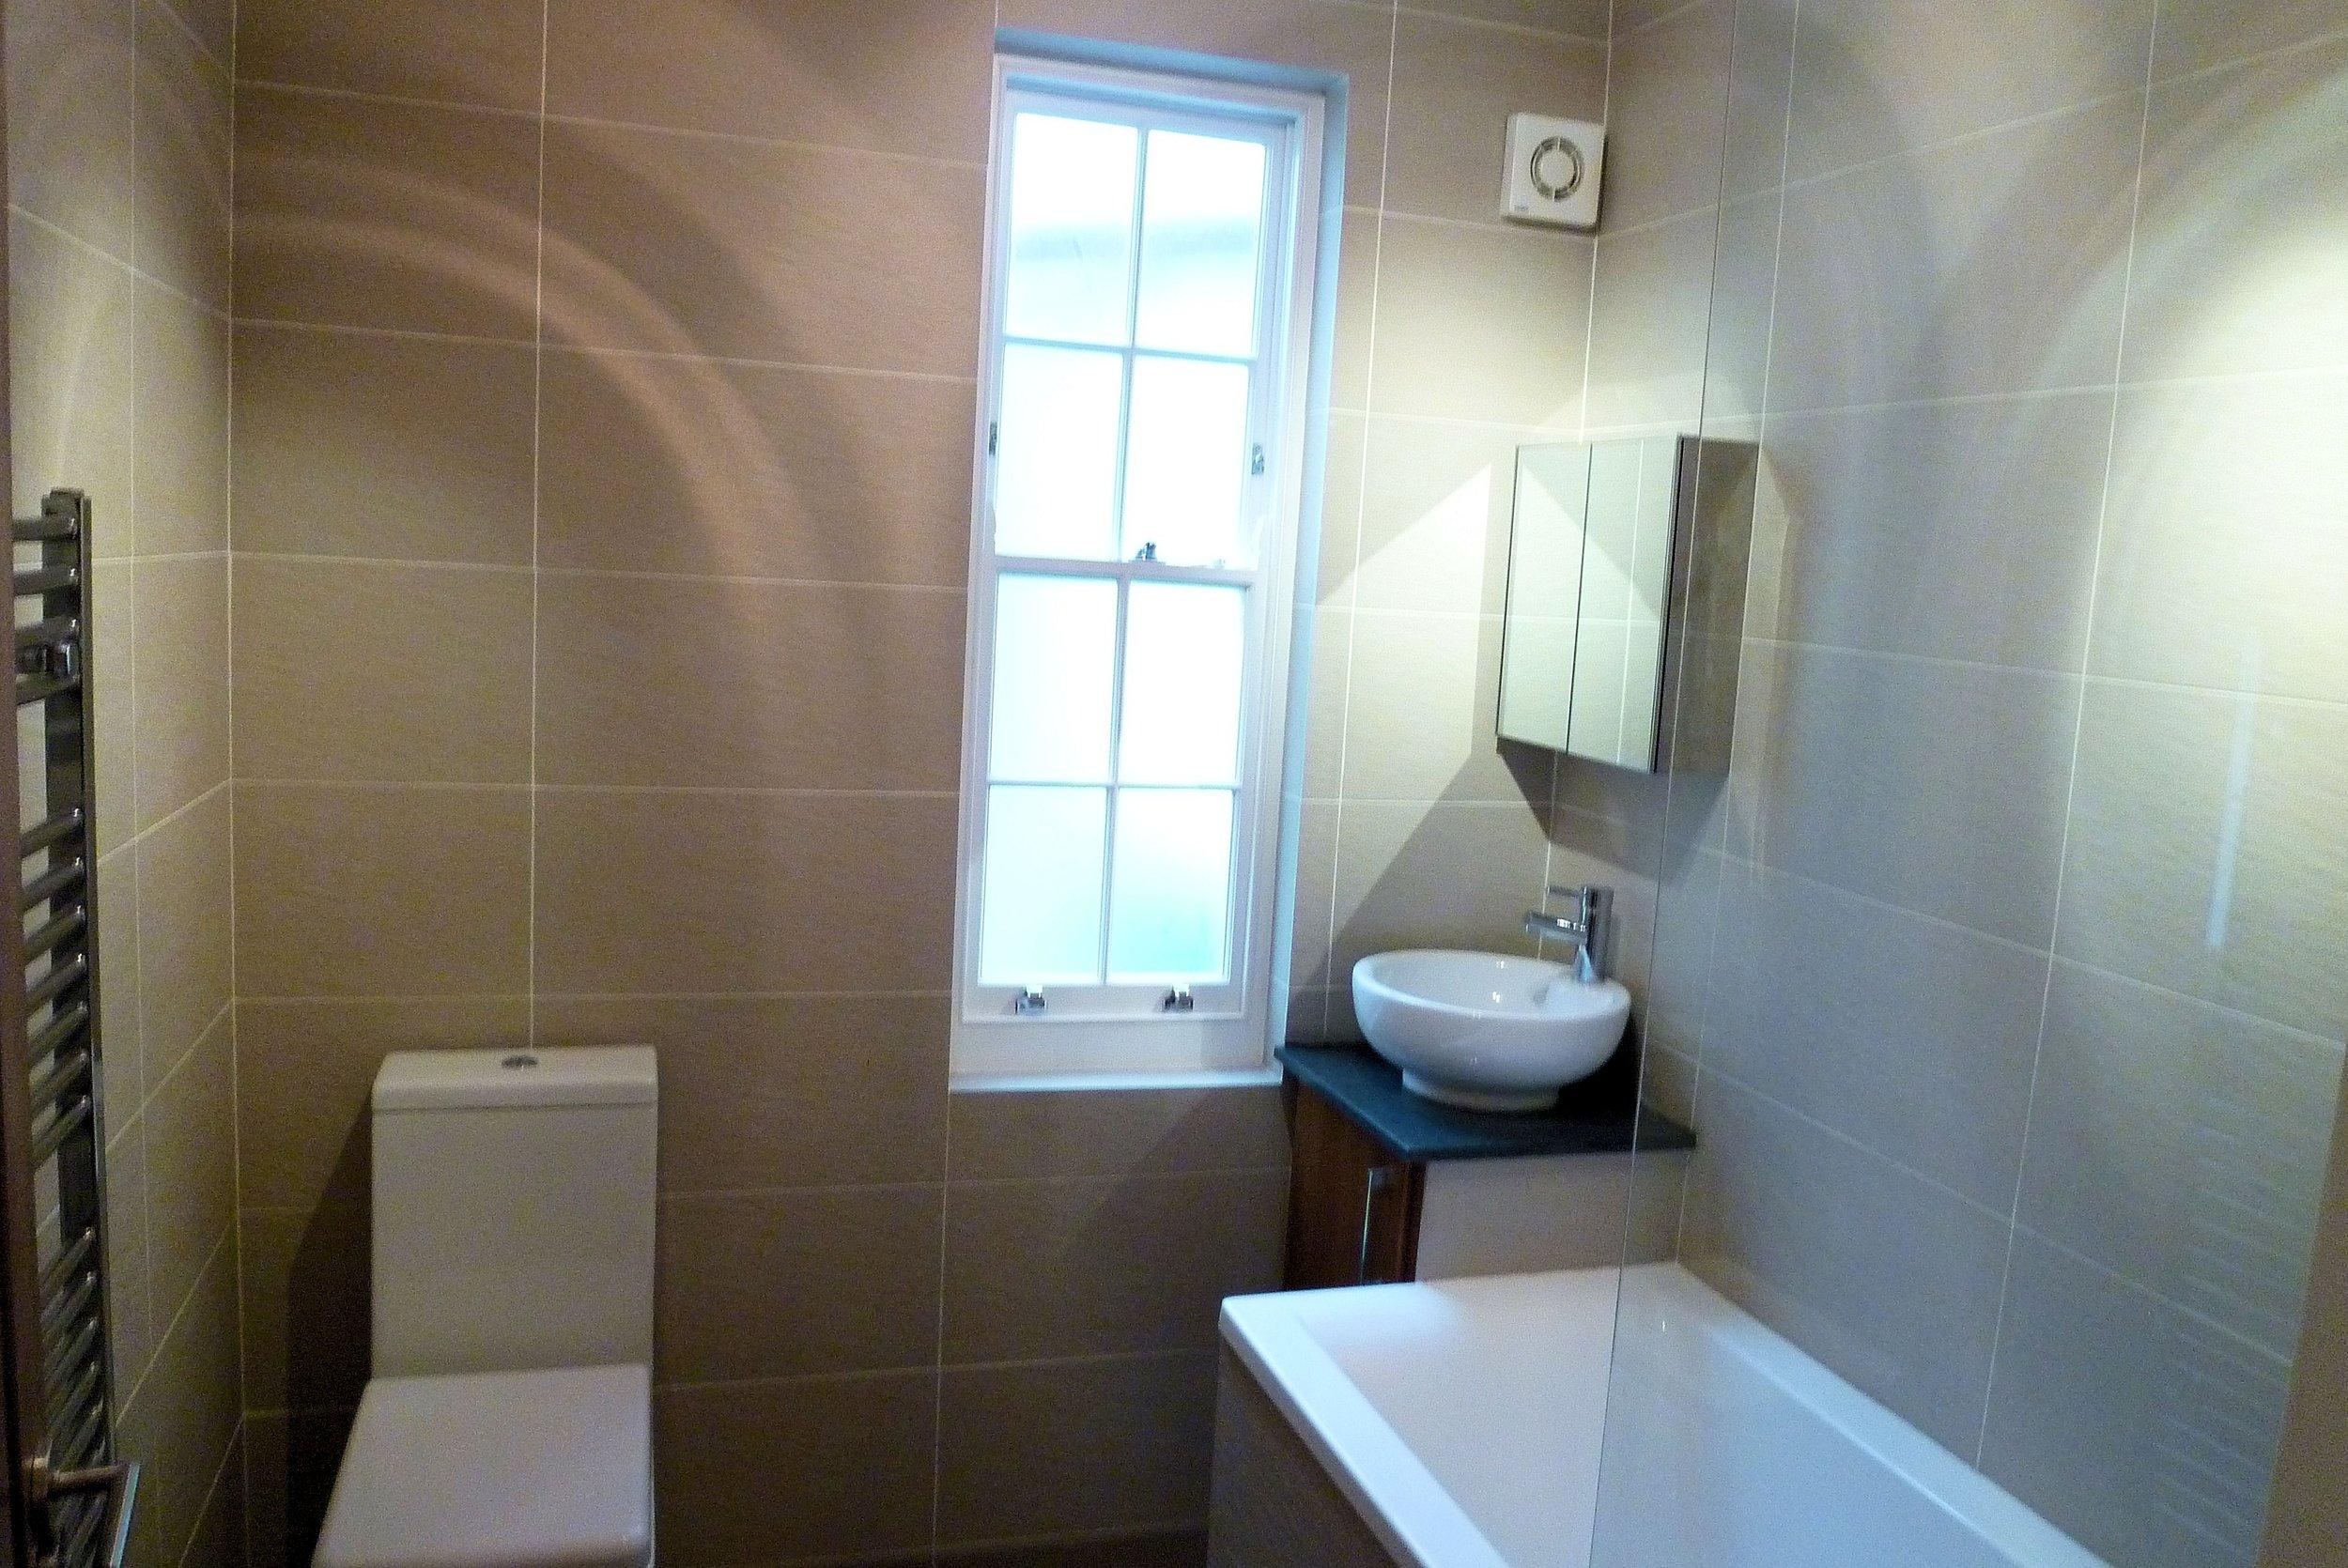 flat 2 bath.jpg